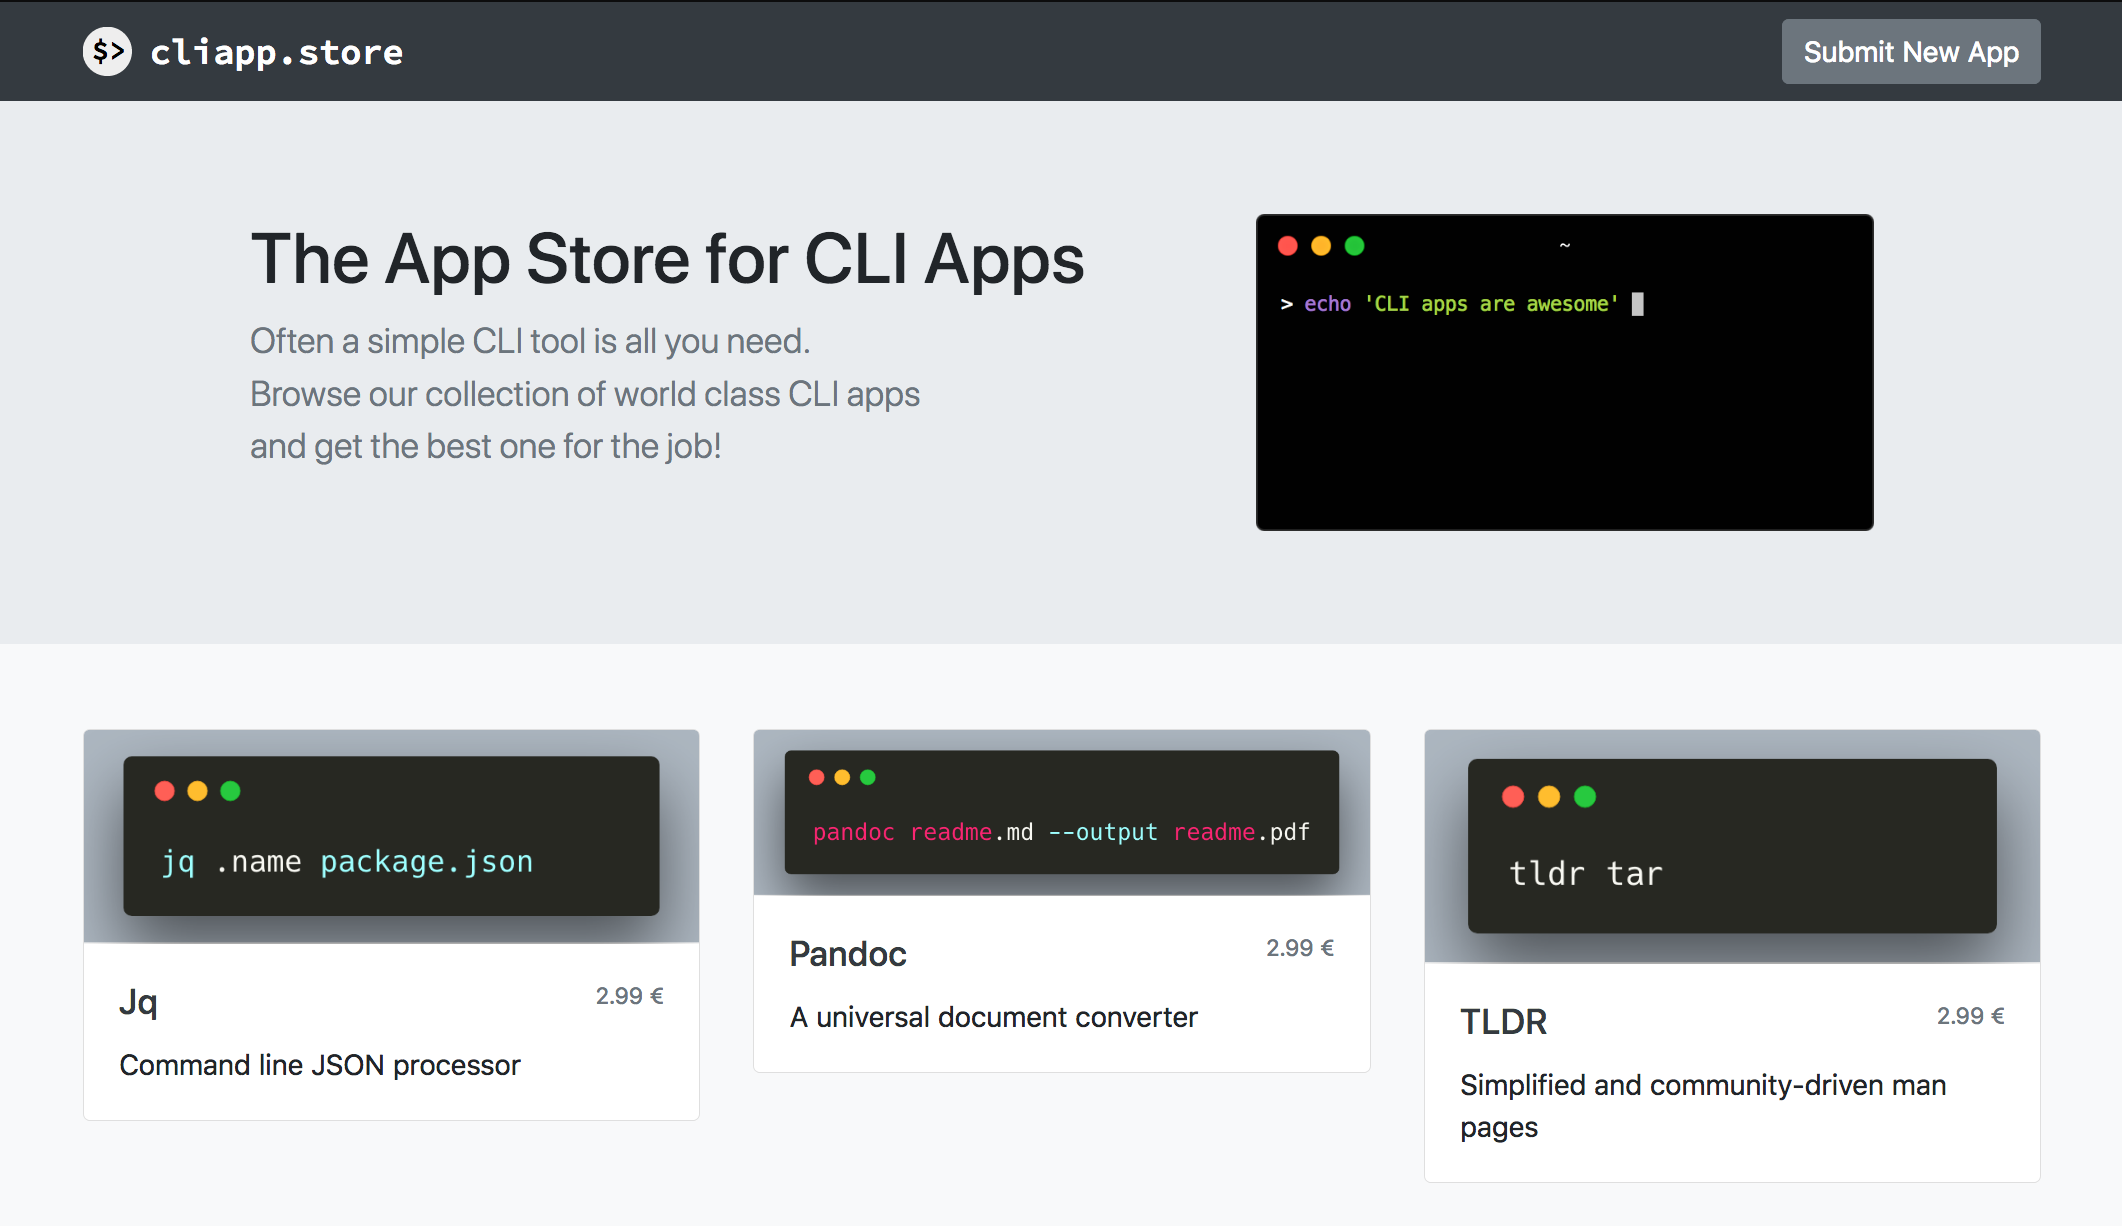 Screenshot of cliapp.store's landing page